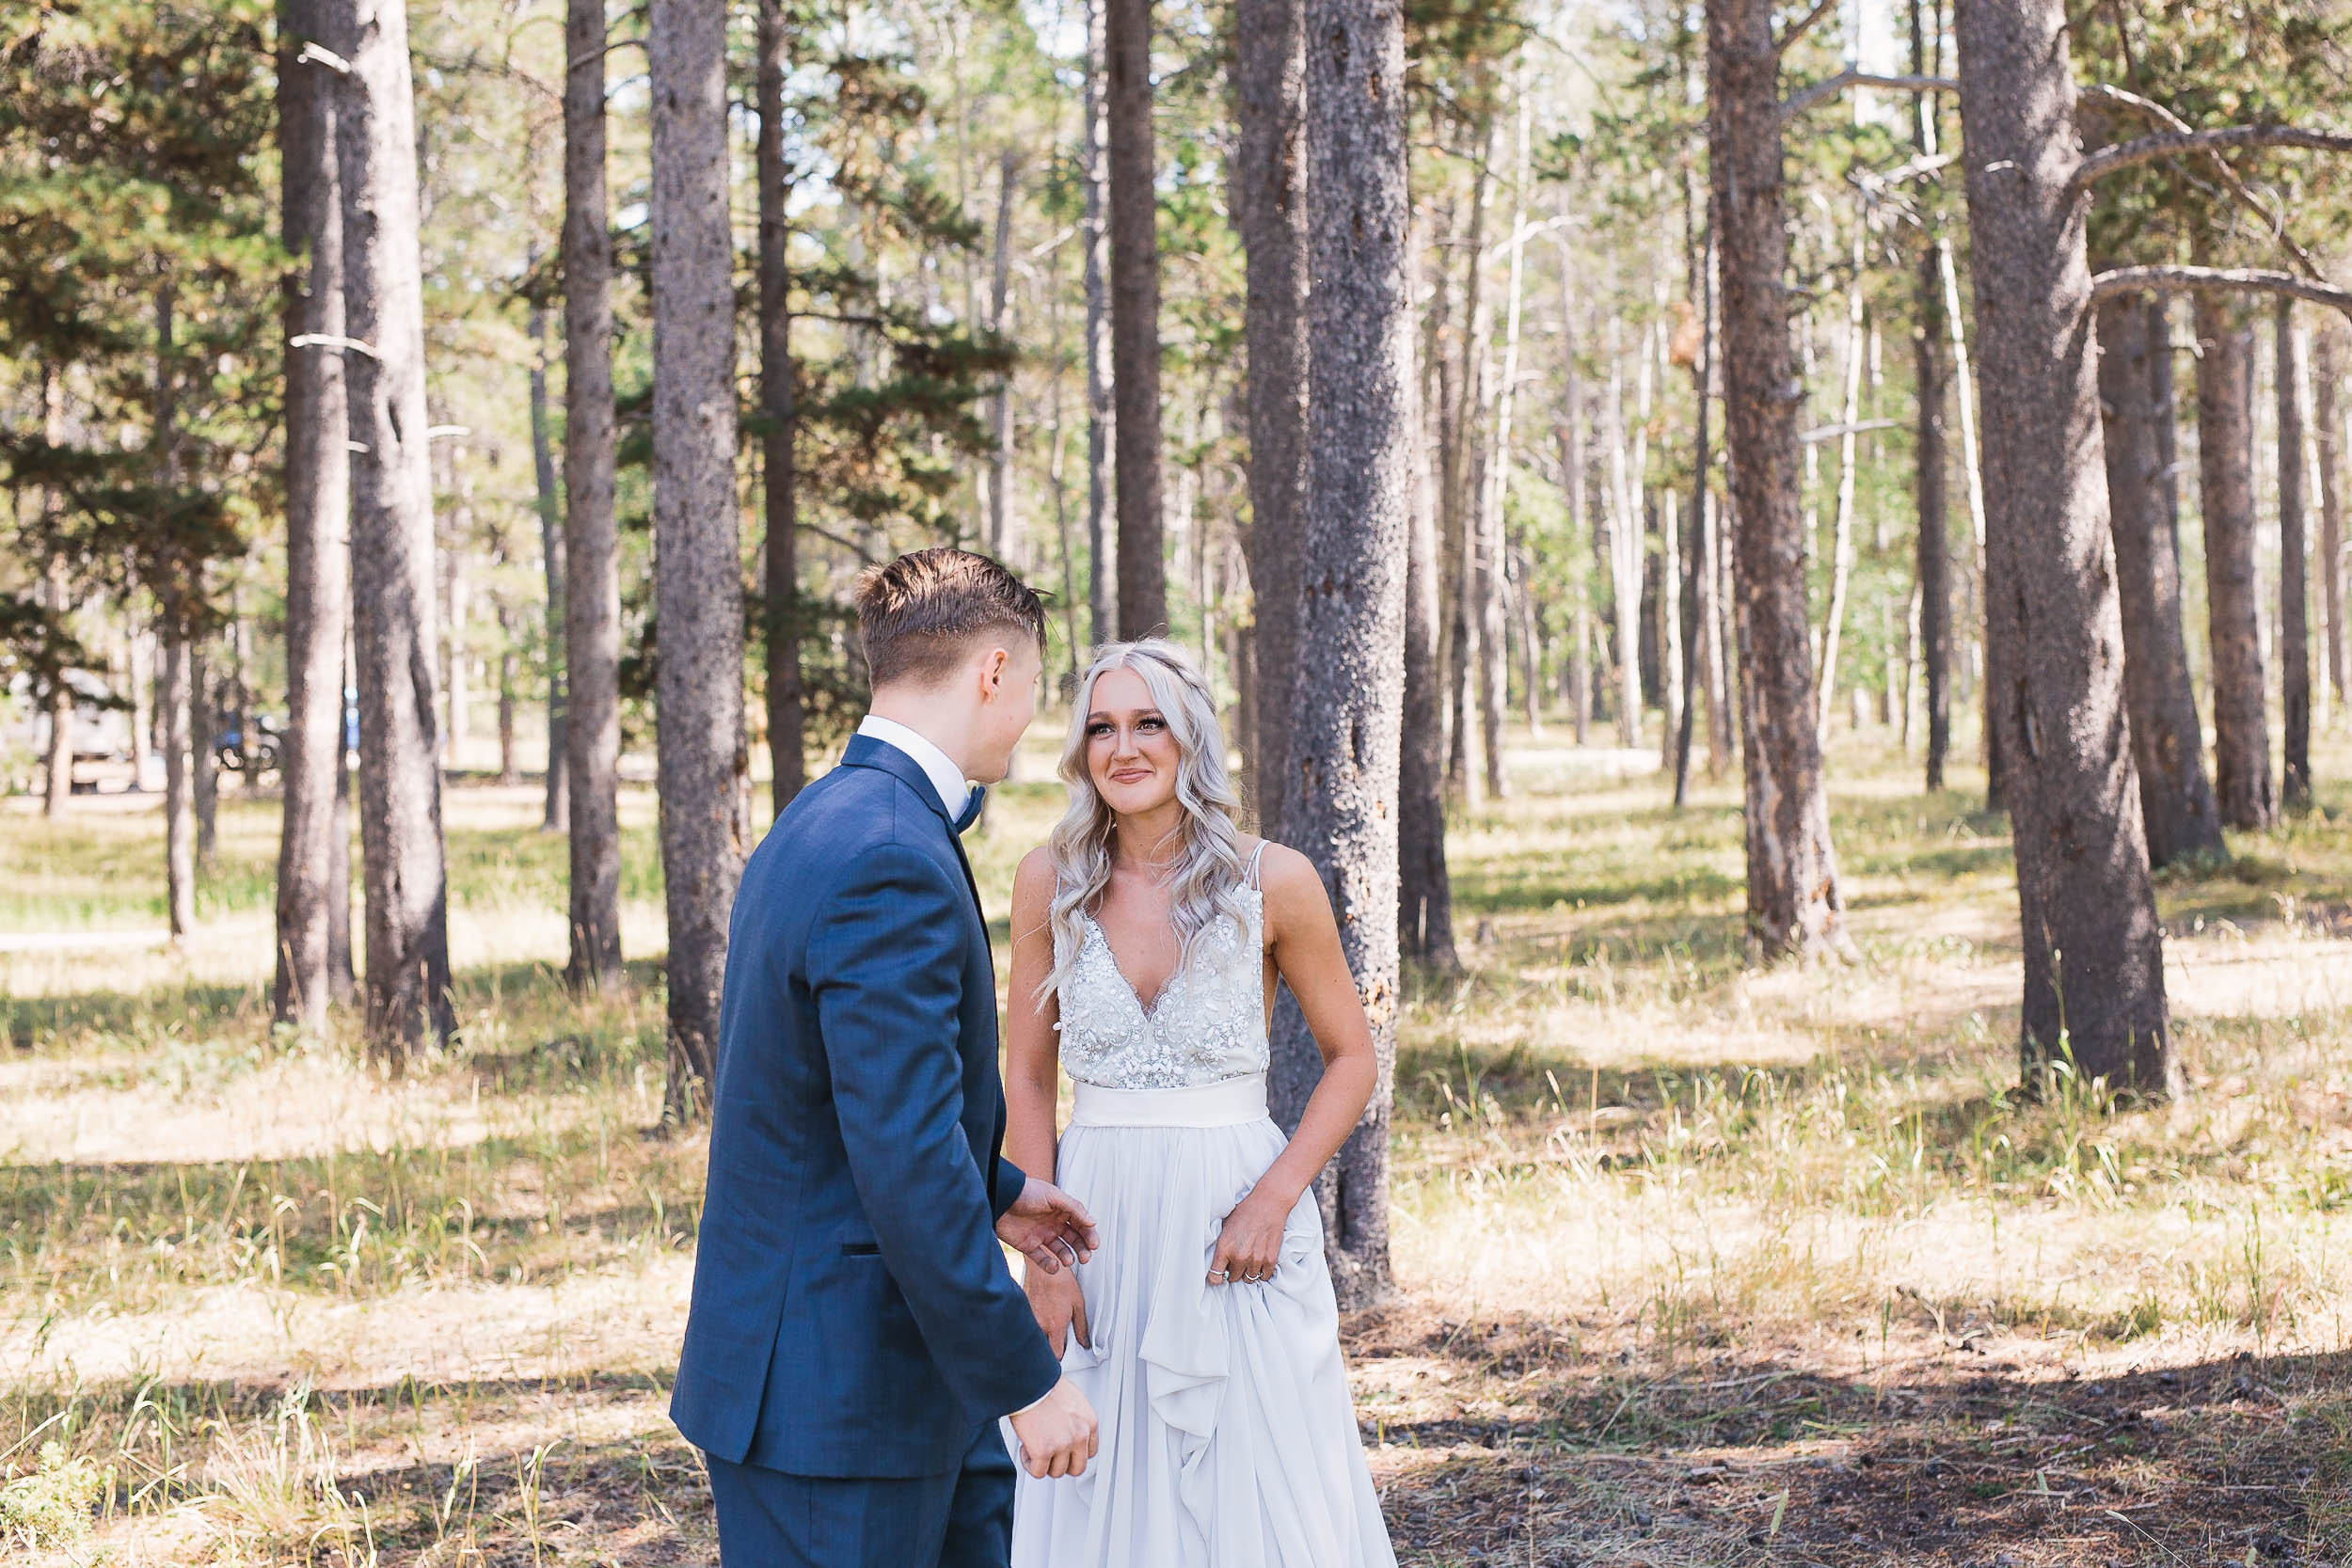 KyleLovesTori-Casper-Wyoming-Wedding-23.jpg